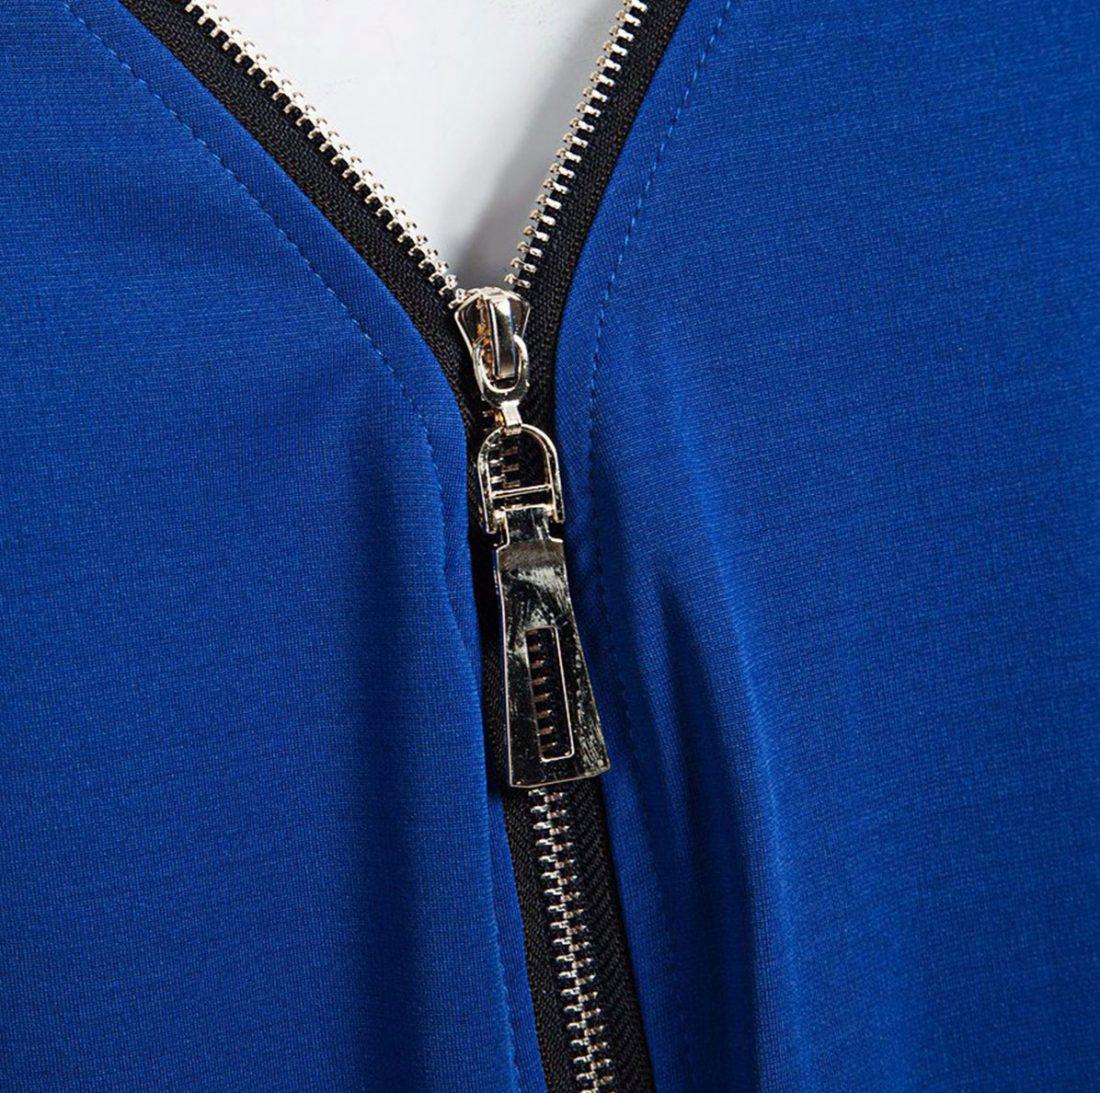 M0185 blue12 Office Evening Dresses maureens.com boutique